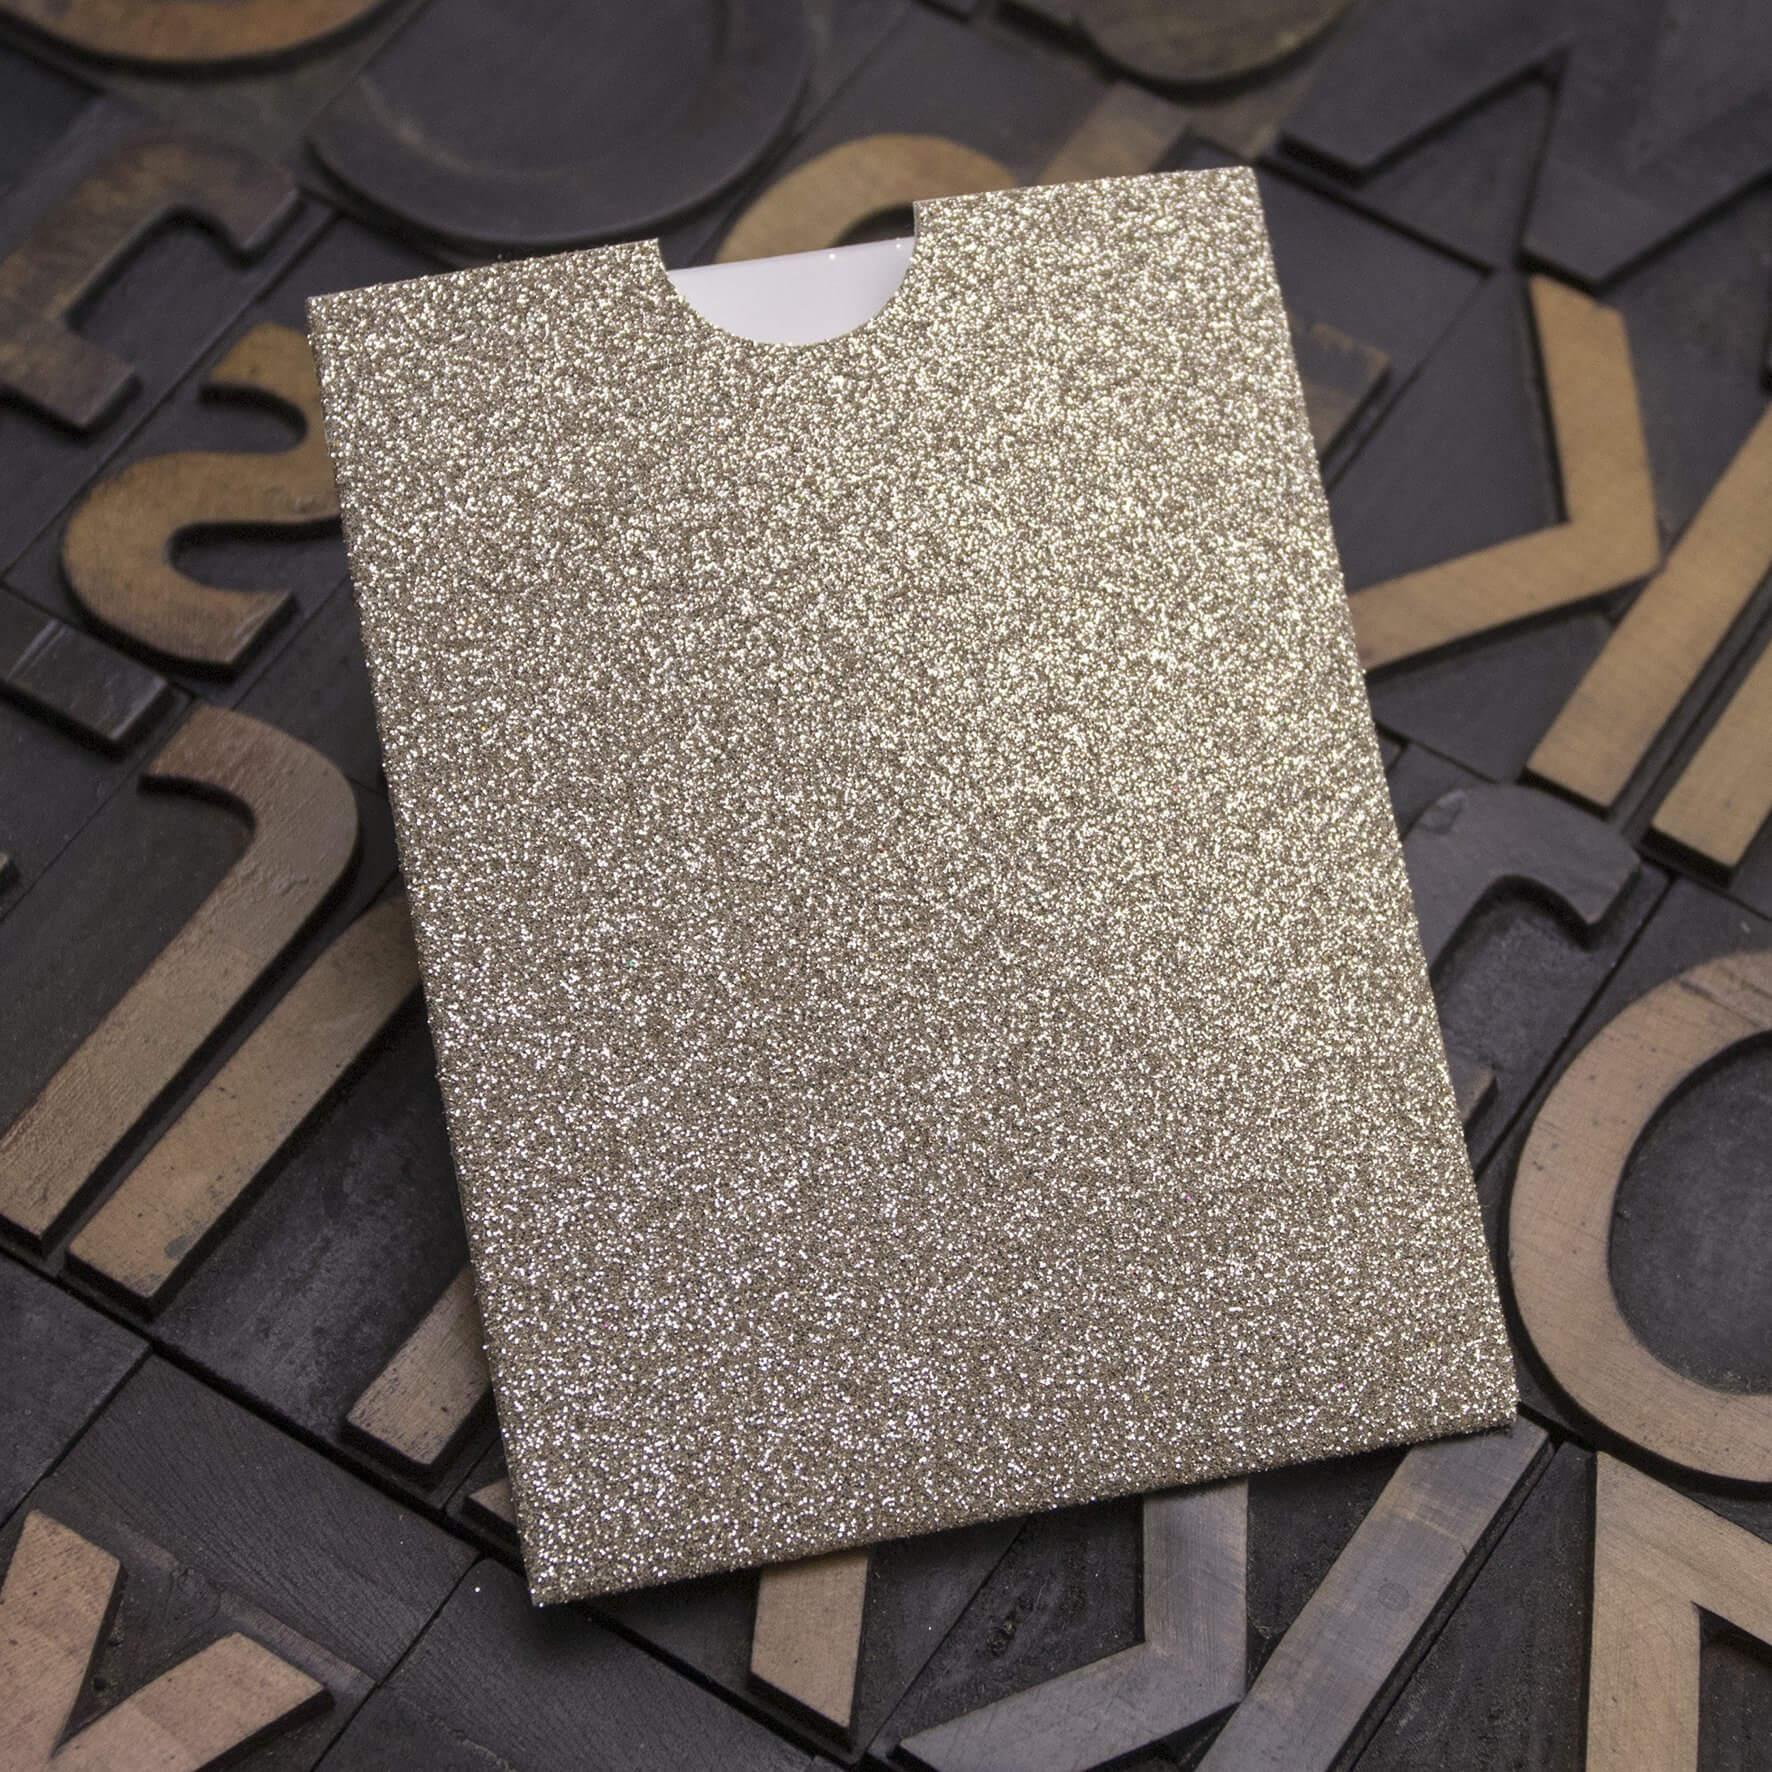 Enfolio Wallet Mini - Champagne Supernova Glitter Card